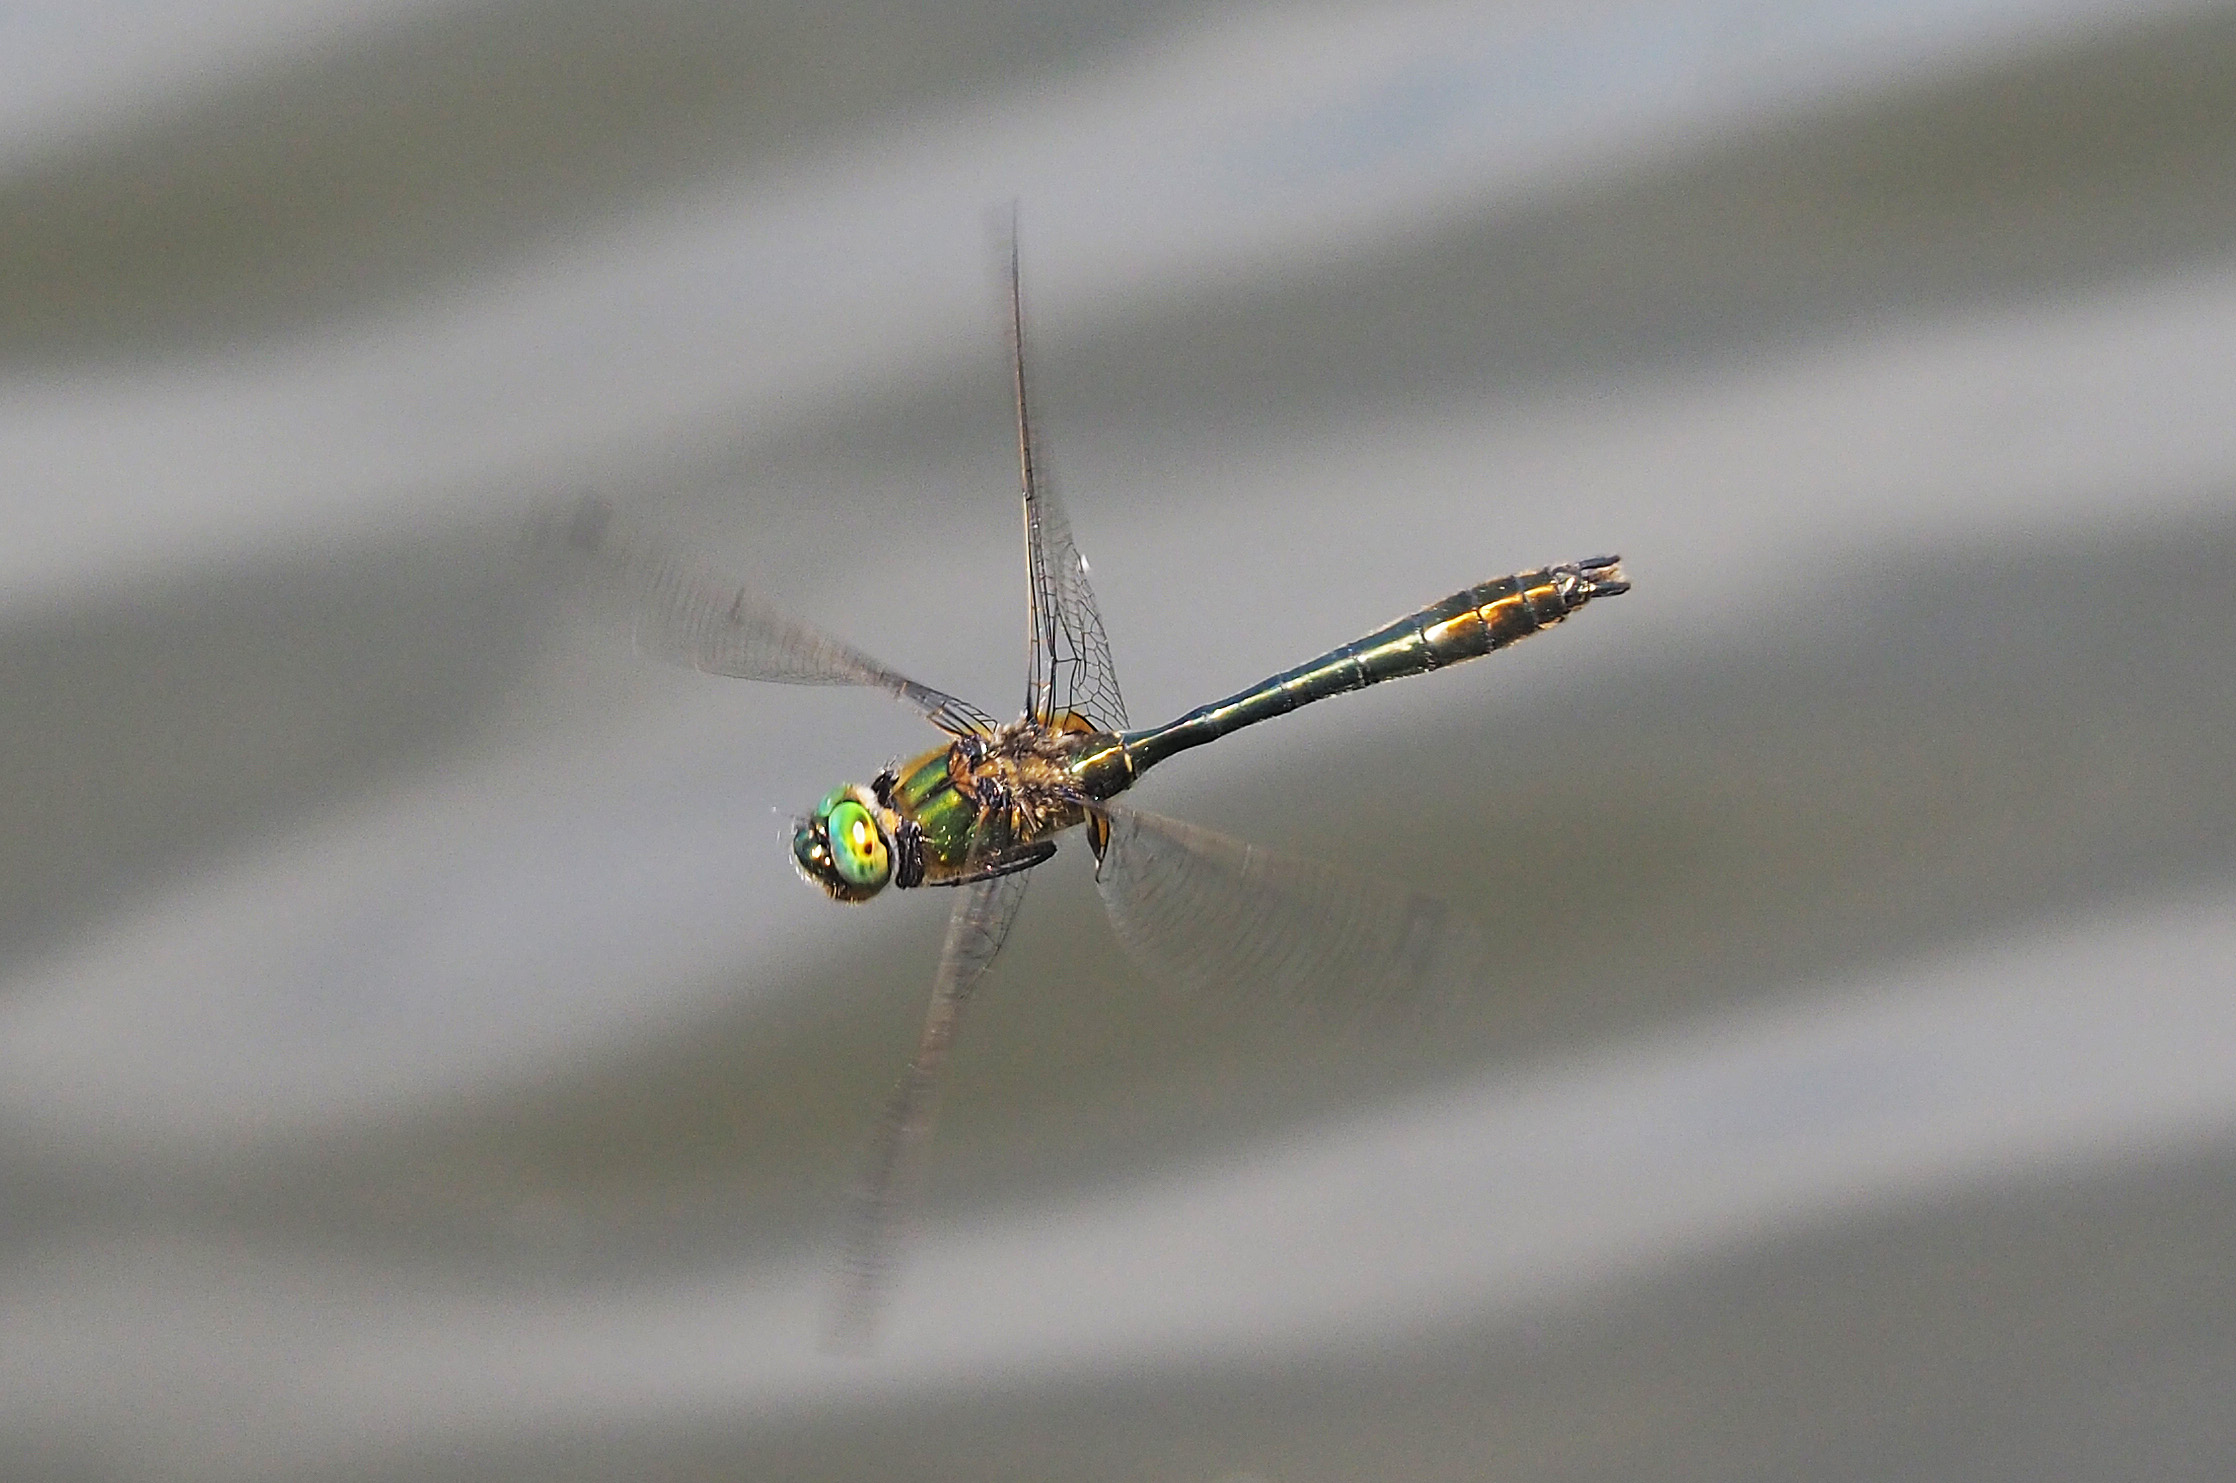 Biologie der Libellen, Falkenlibelle Cordulia aenea im Flug, CC-BY-SA-4.0, Hansruedi Wildermuth, Rüti, Switzerland